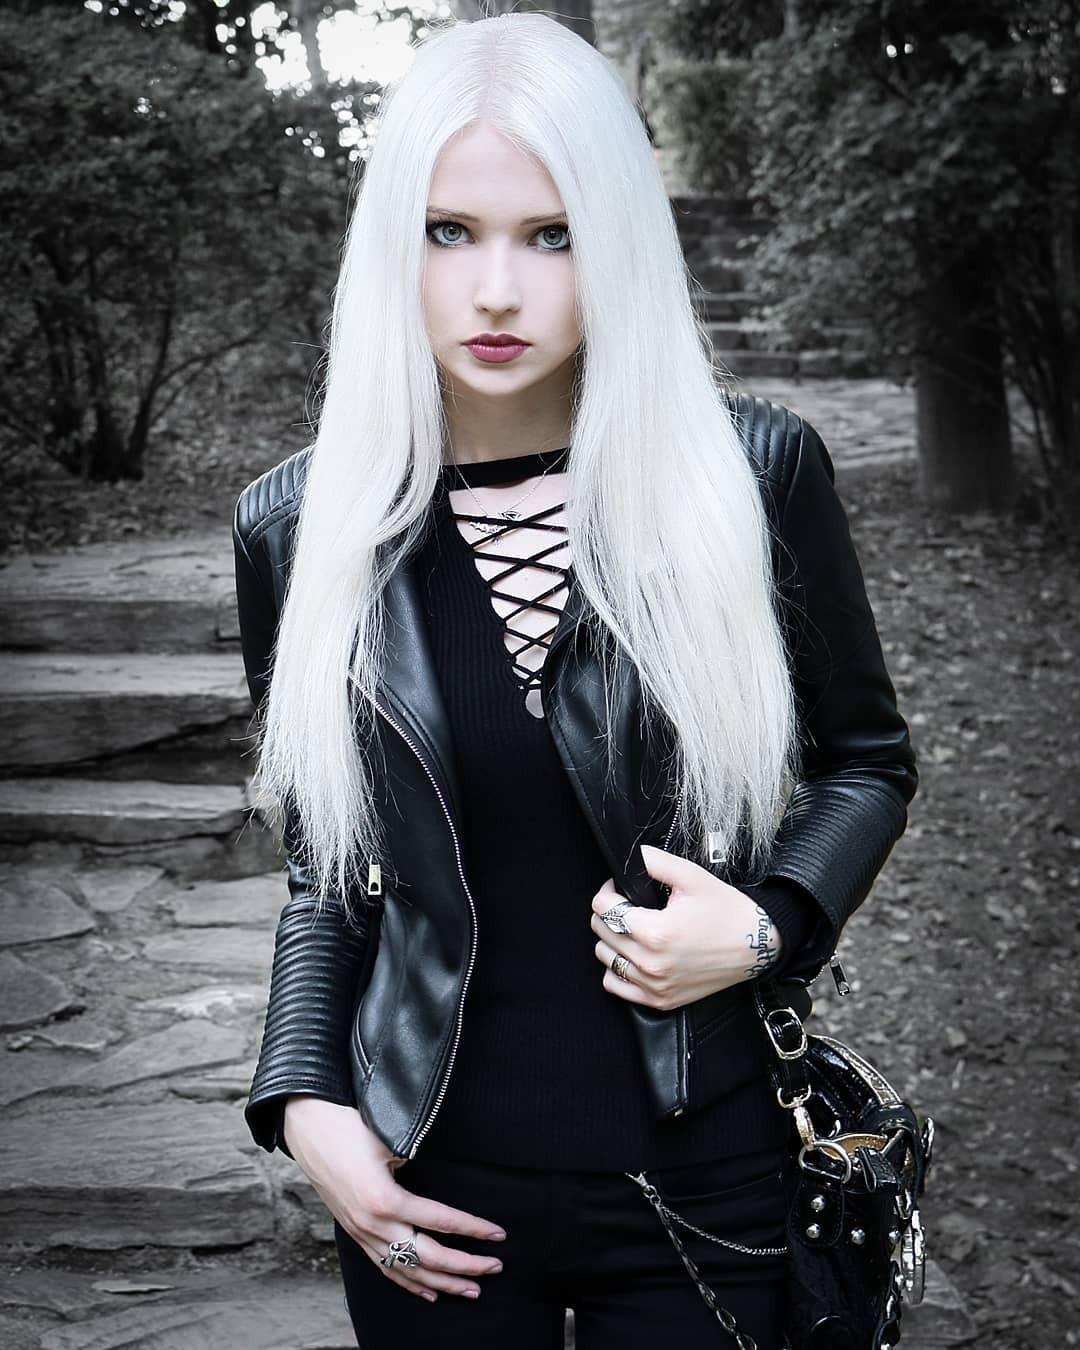 Gothic Goth Girl Fashion: Pin On Boss Girls